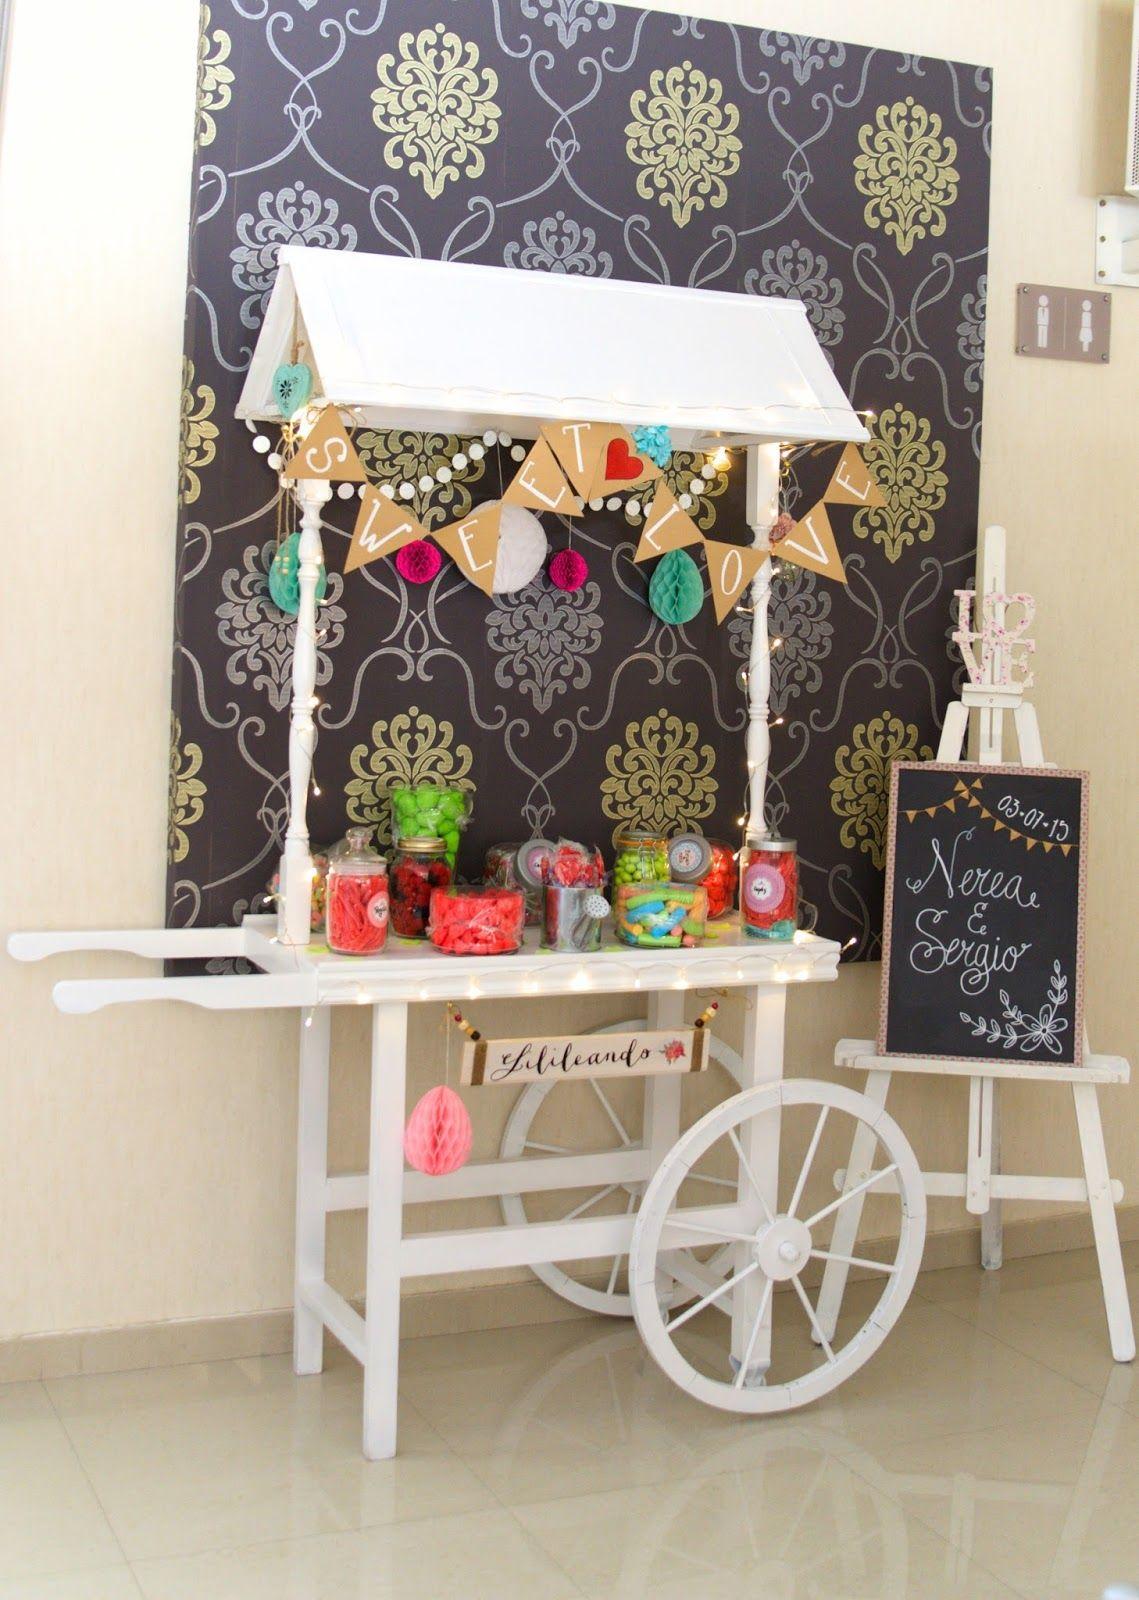 Lilileando carrito dulce de lilileando torre eiffel dulces carritos de dulces y carreta de - Ideas para decorar mesas de chuches ...